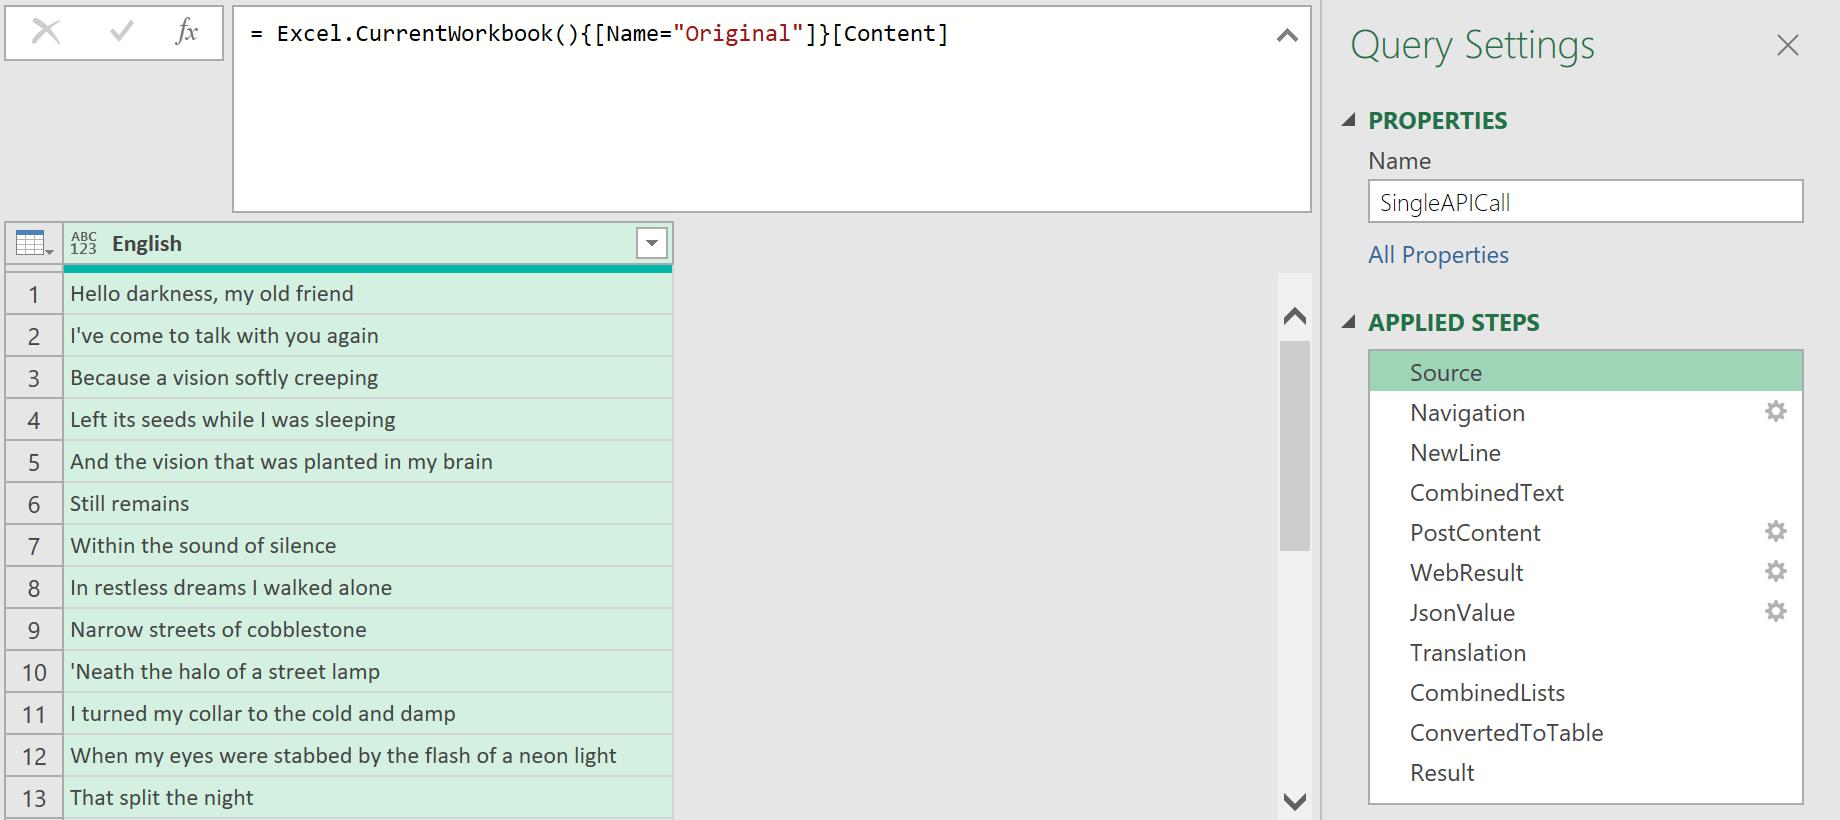 Excel.CurrentWorkbook function